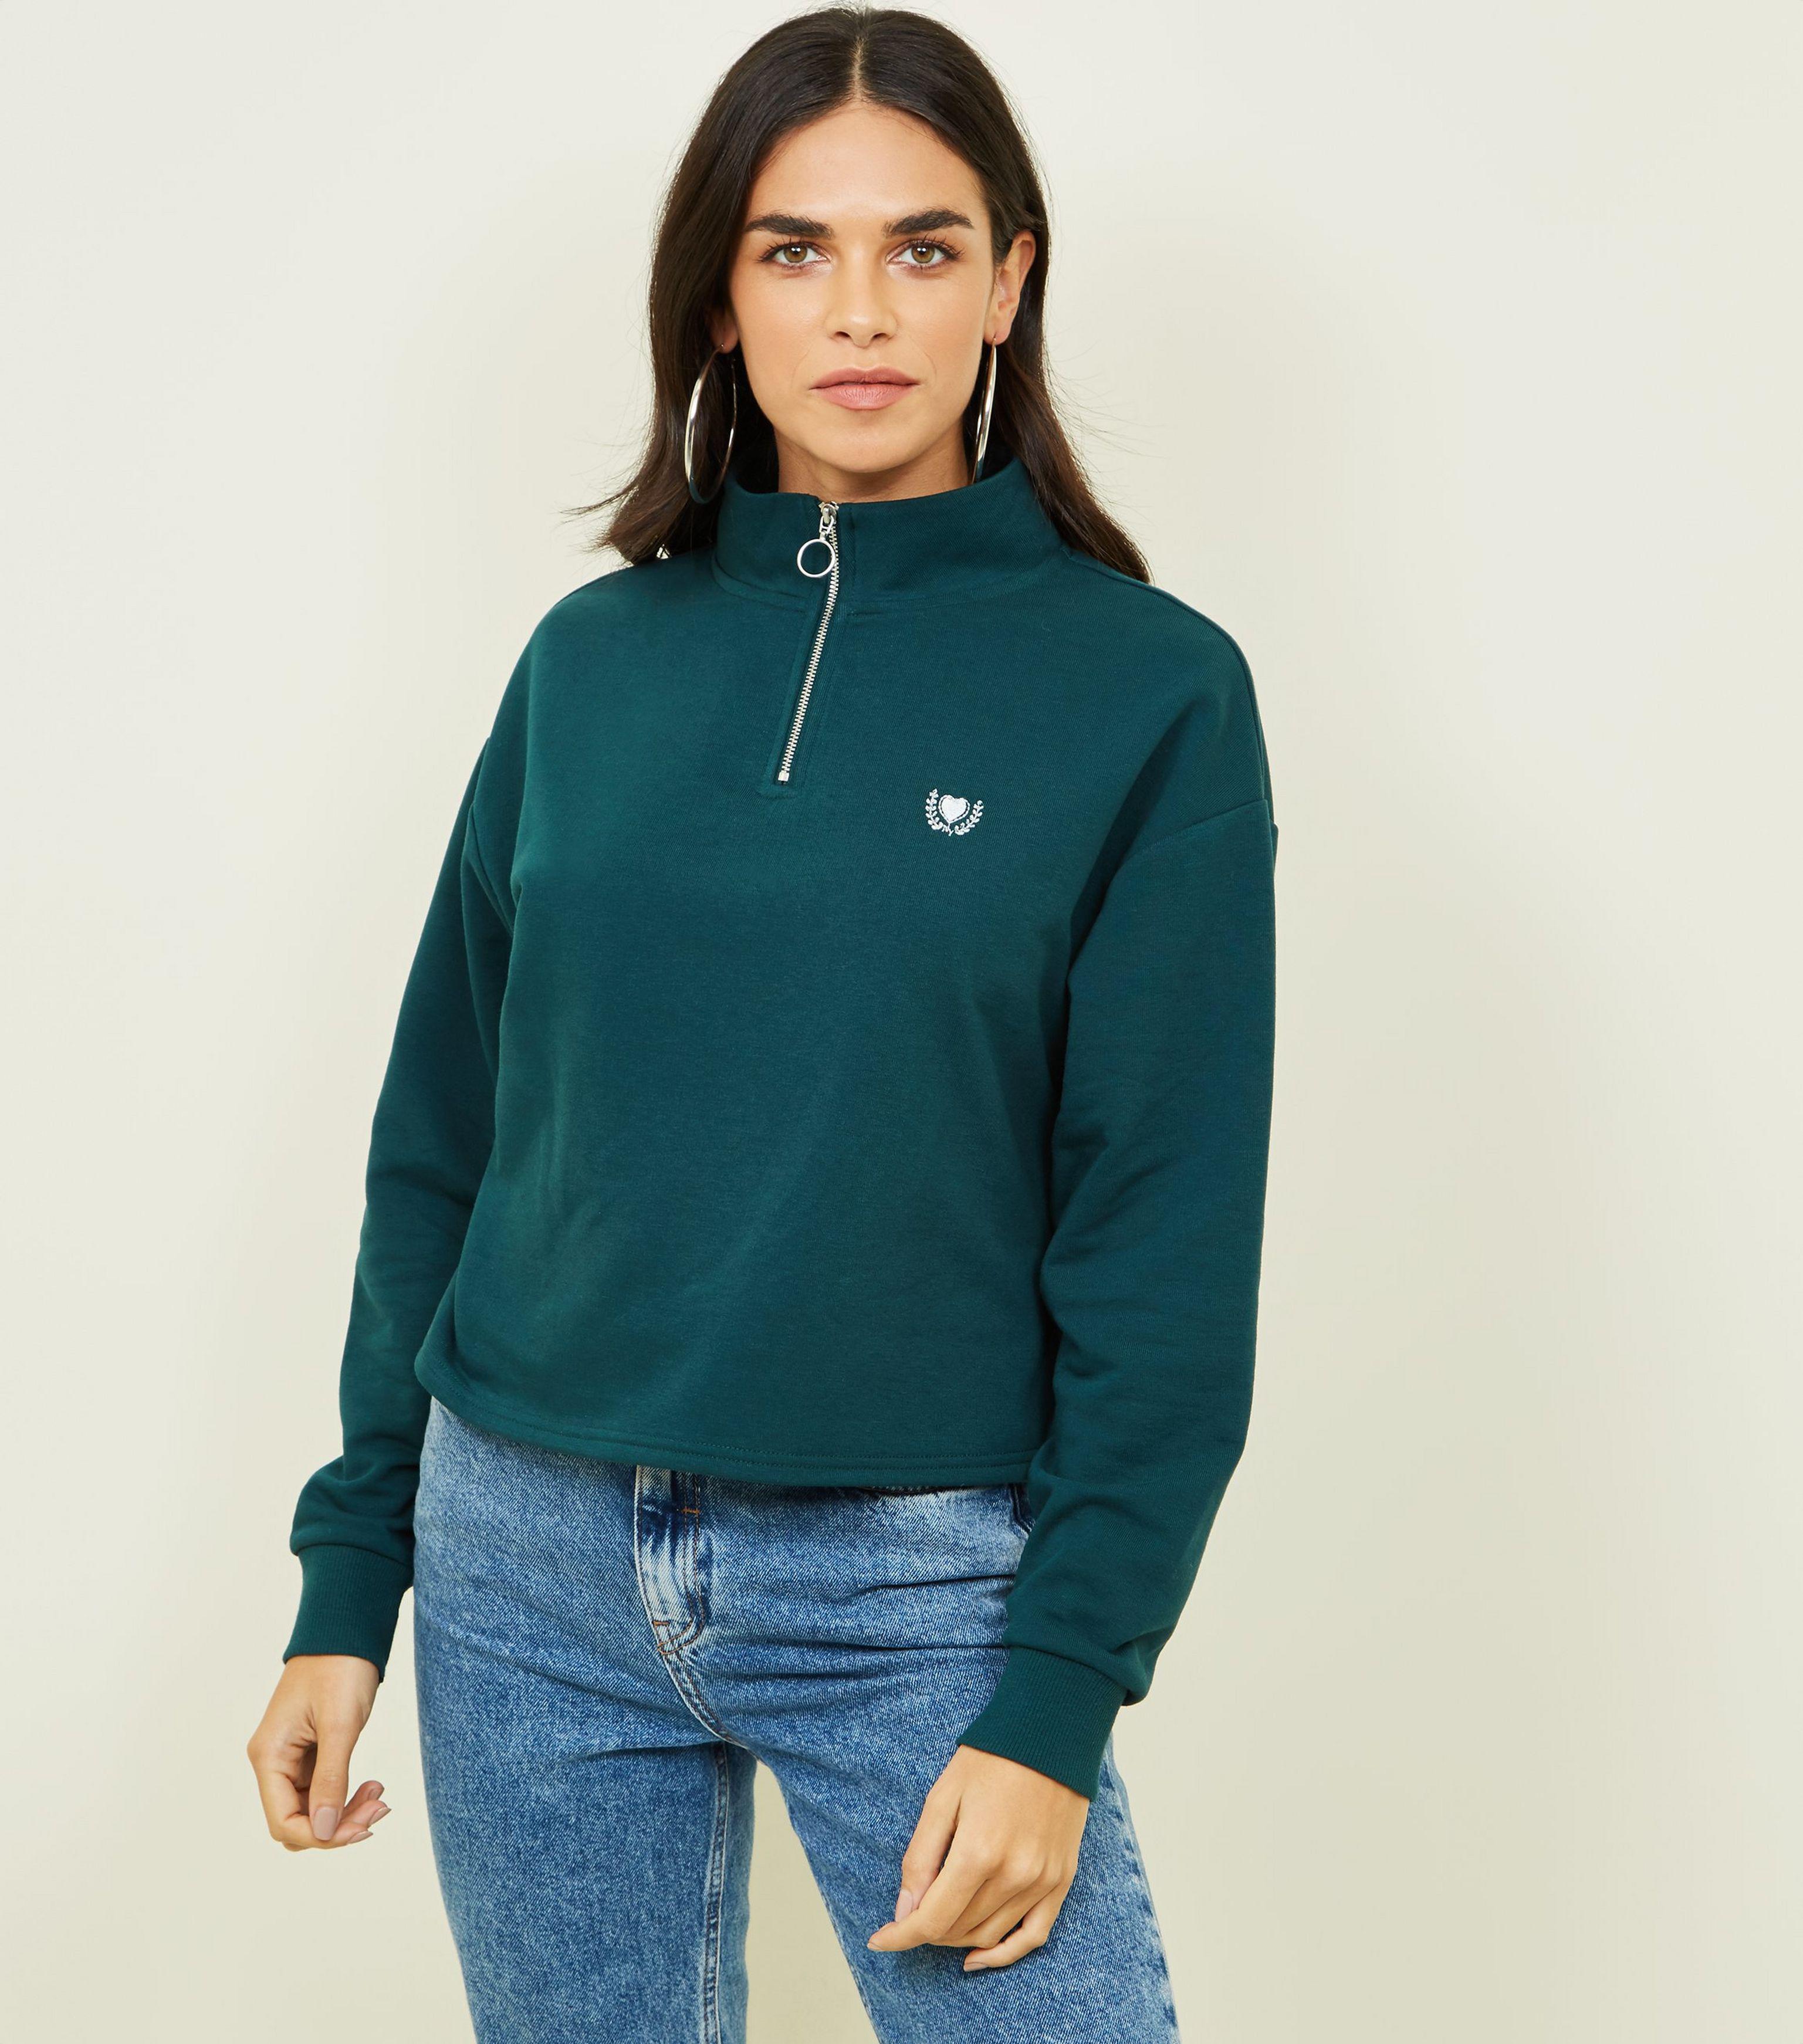 bec039a1f6a9 New Look Dark Green Heart Crest Zip Neck Sweatshirt in Green - Lyst